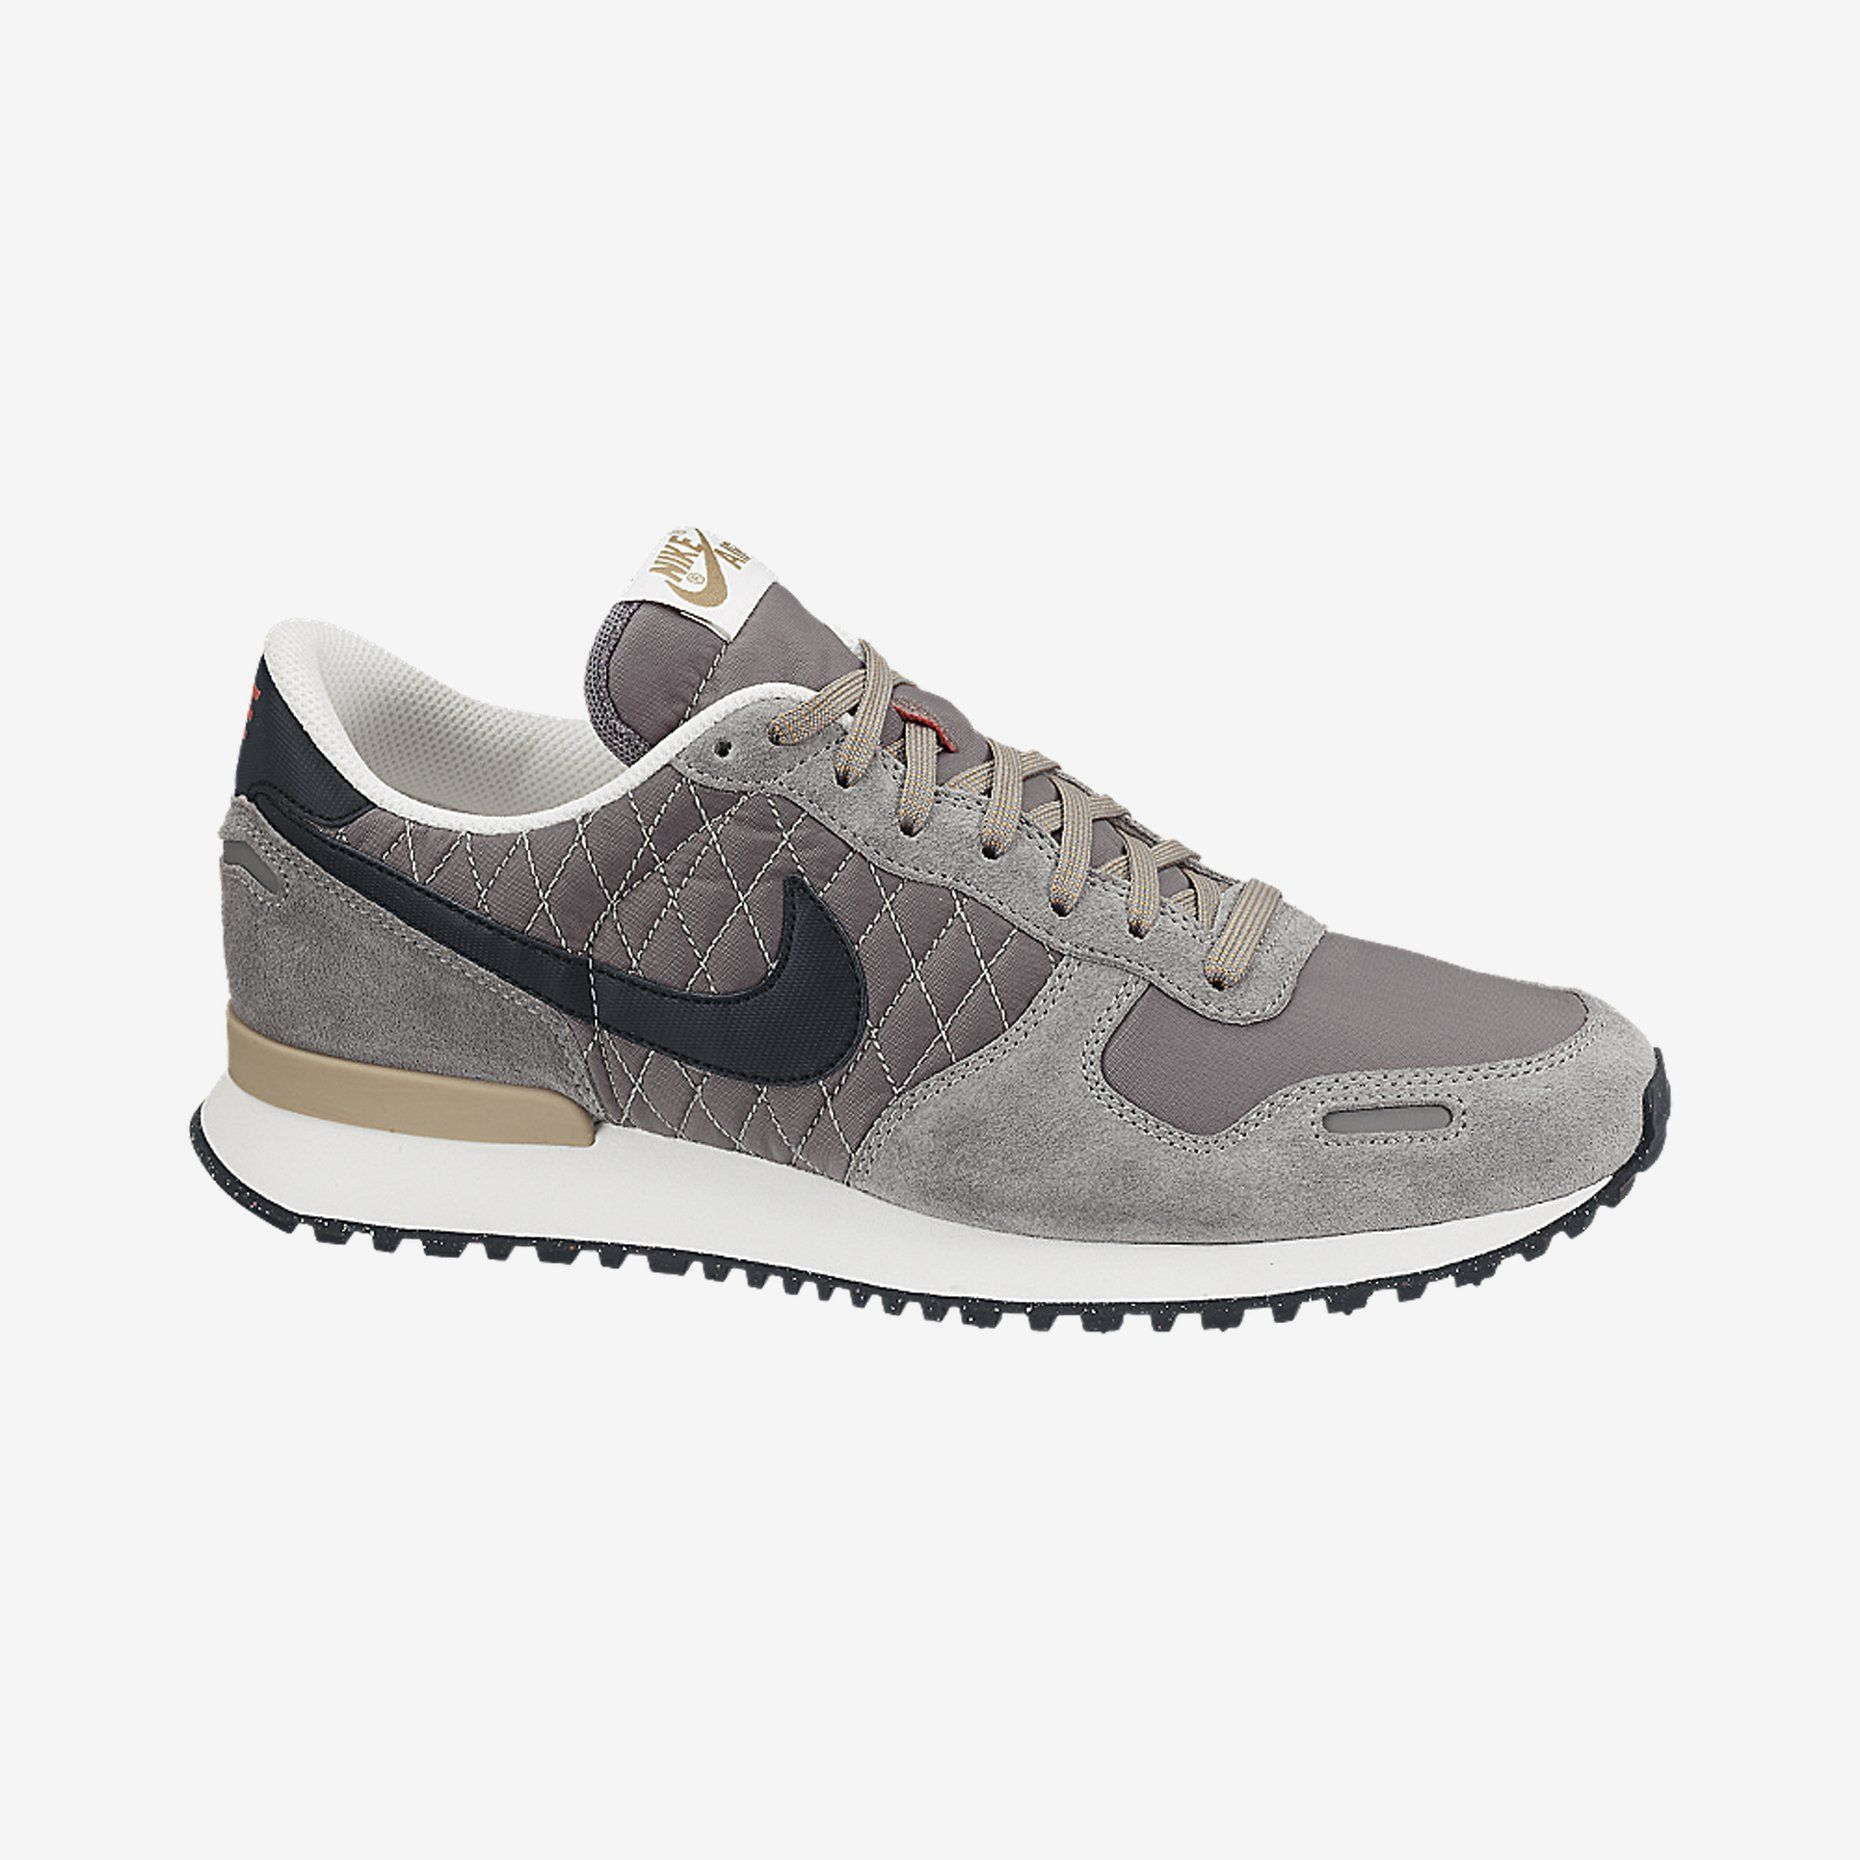 675ddf2147 Nike Air Vortex Vintage Sneakers - Musée des impressionnismes Giverny